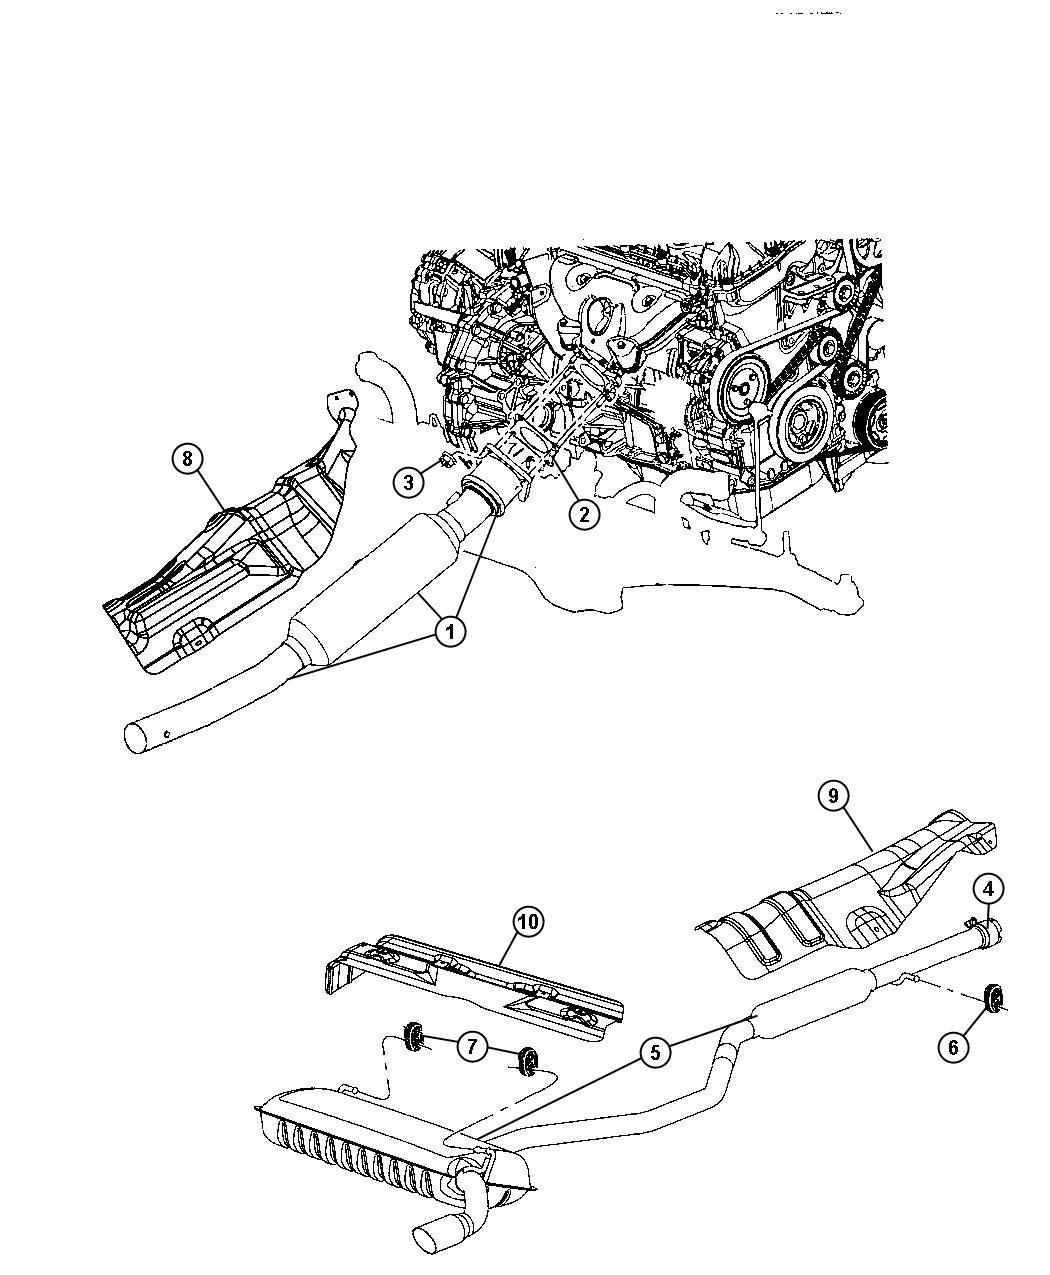 Jeep Patriot Shield Floor Pan Heat Muffler Rear Rear